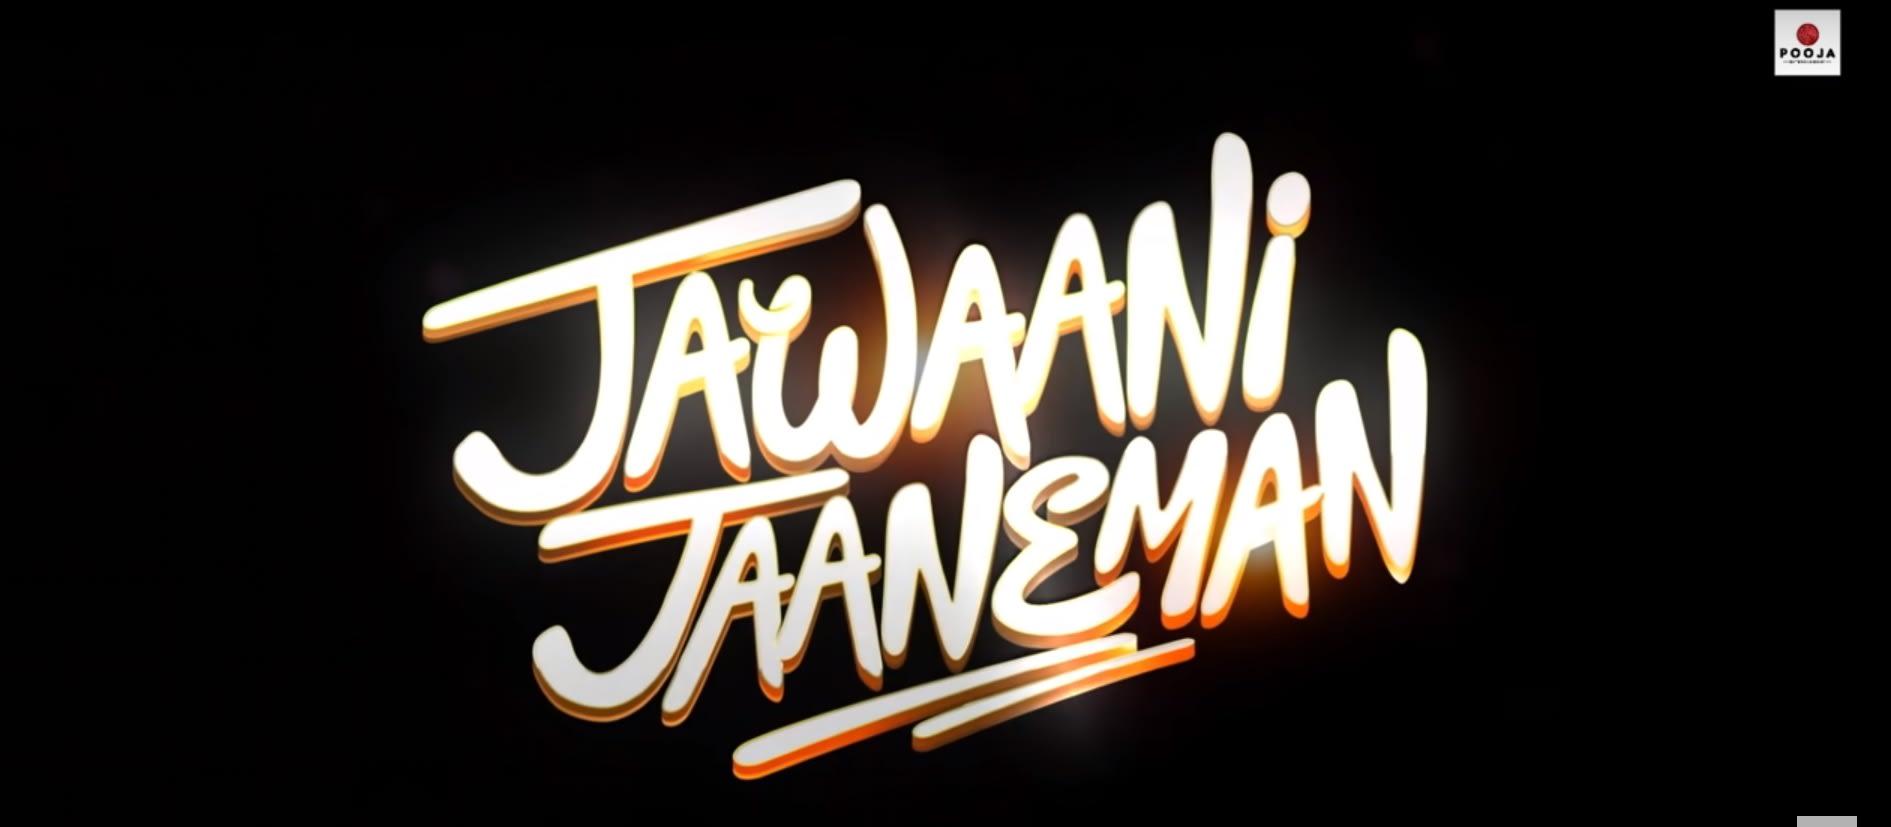 Jawaani Jaaneman full movie download in 720p